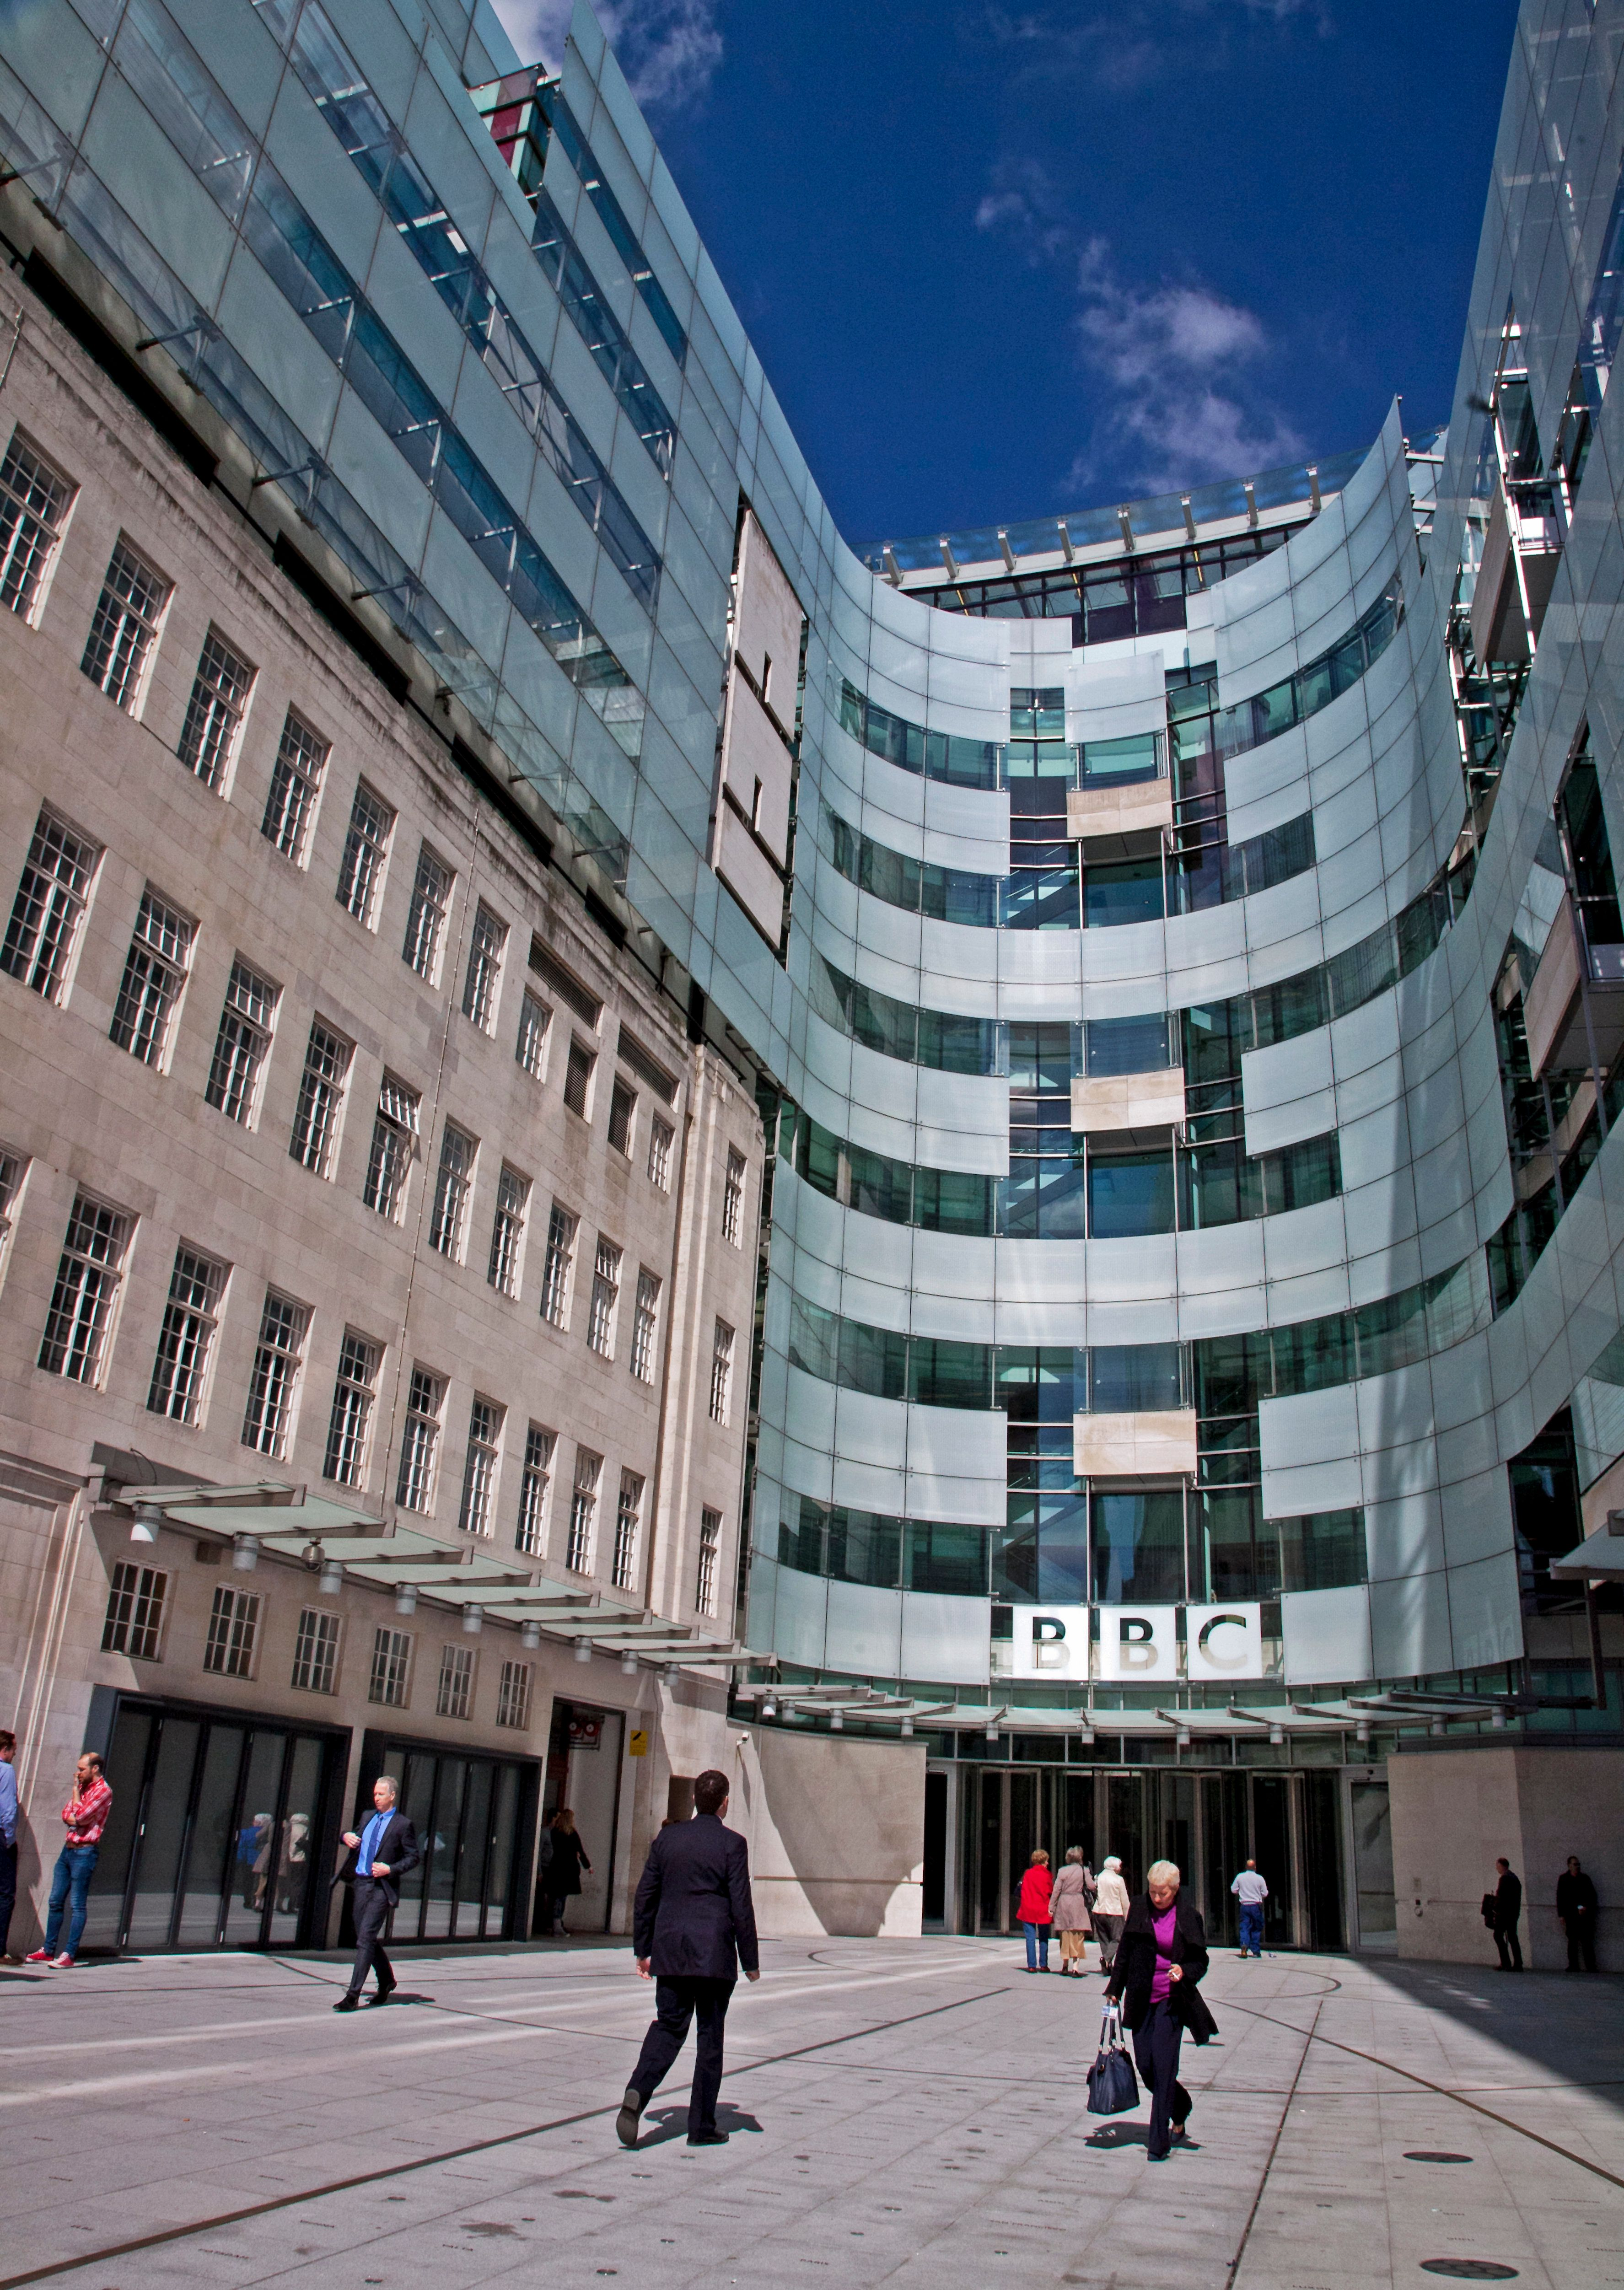 Arif Ansari Trial: Rotherham Sexual Abuse Victim 'Felt Sick' When BBC Revealed Her